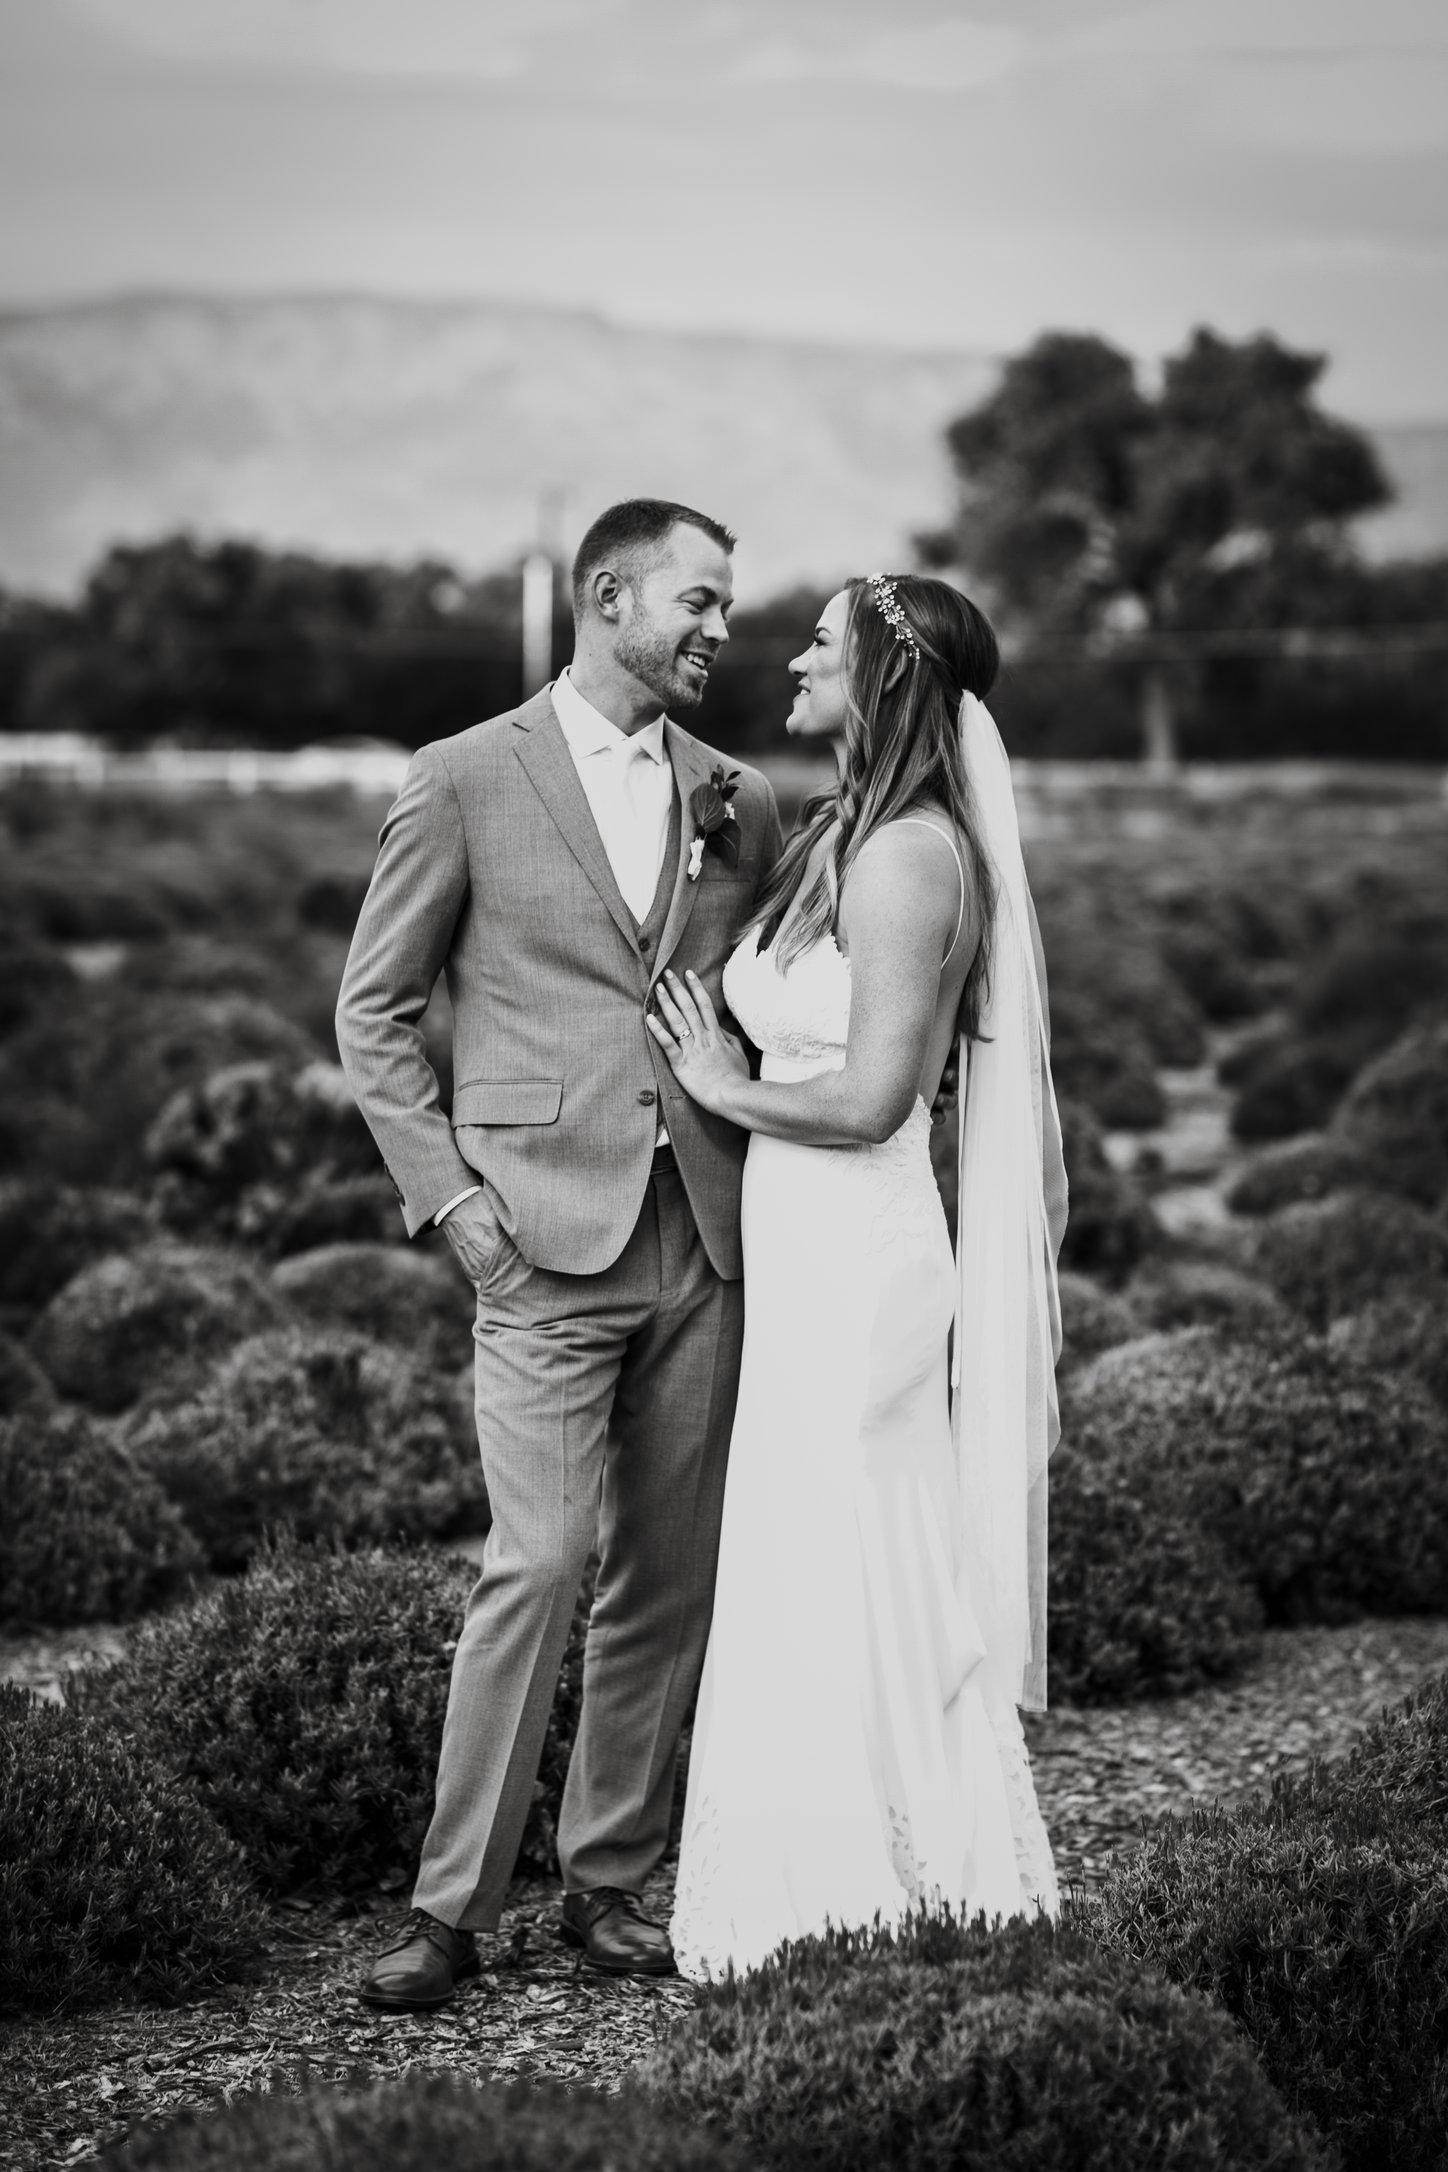 DandA-wedding-735.jpg